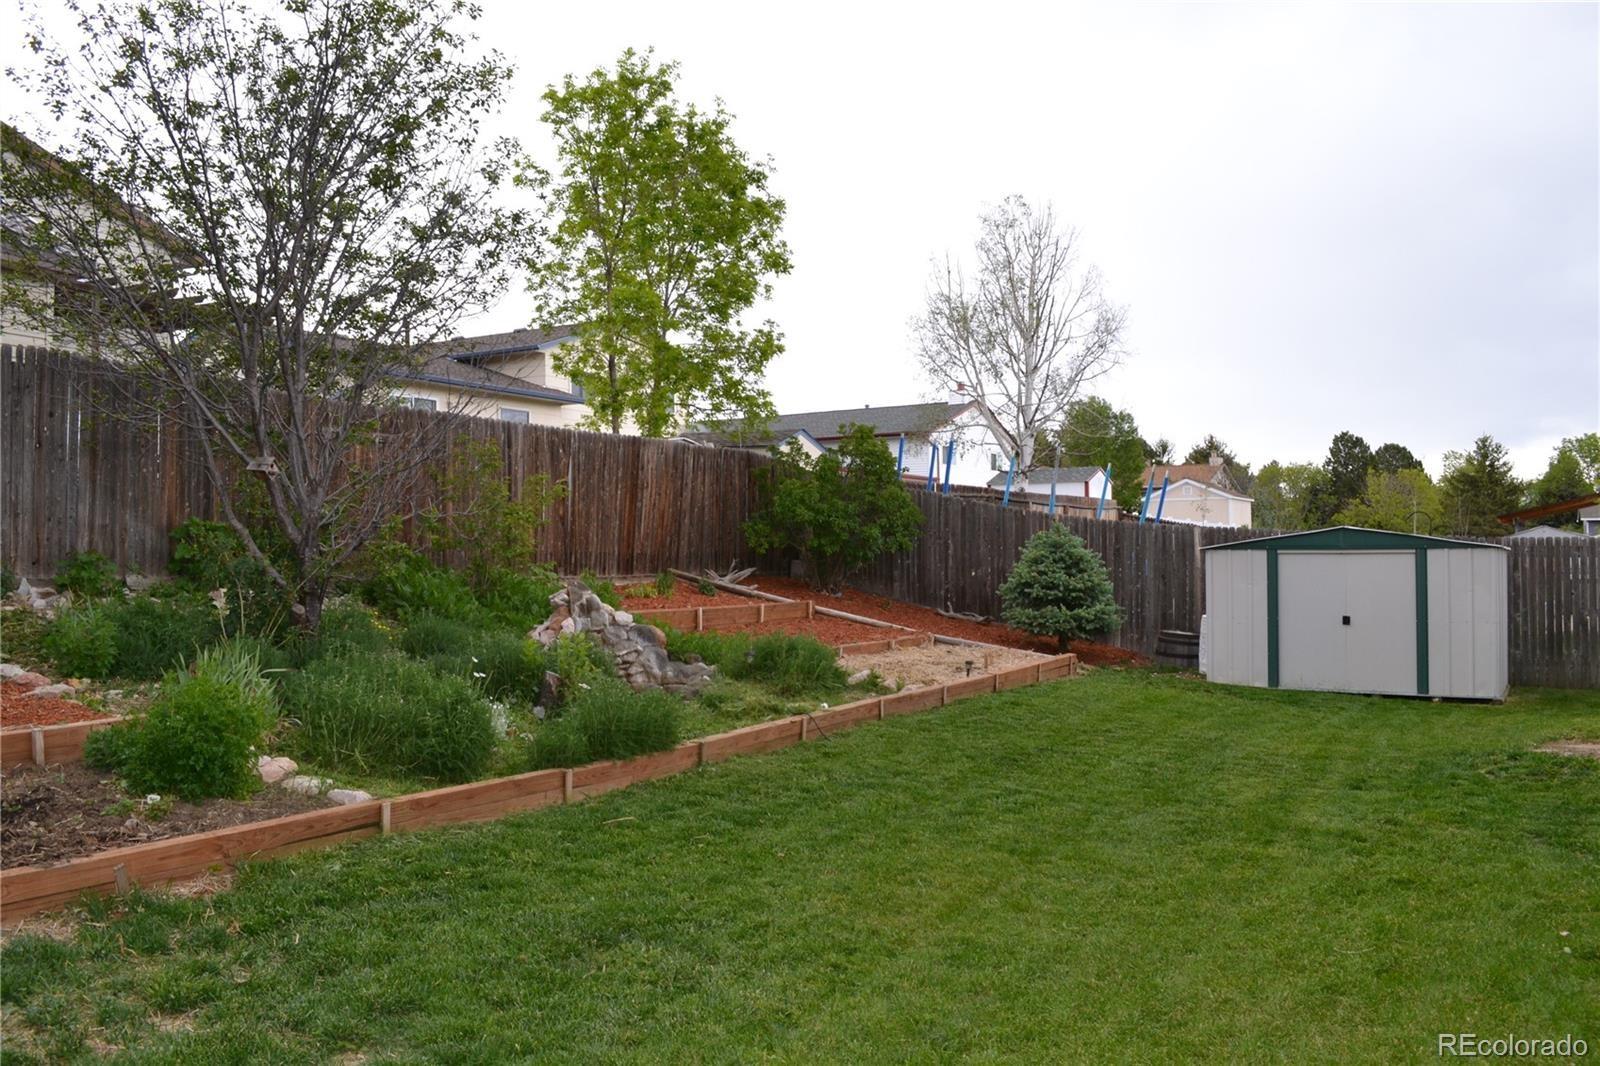 MLS# 4486712 - 15 - 5616 Trout Creek Pass Drive, Colorado Springs, CO 80917